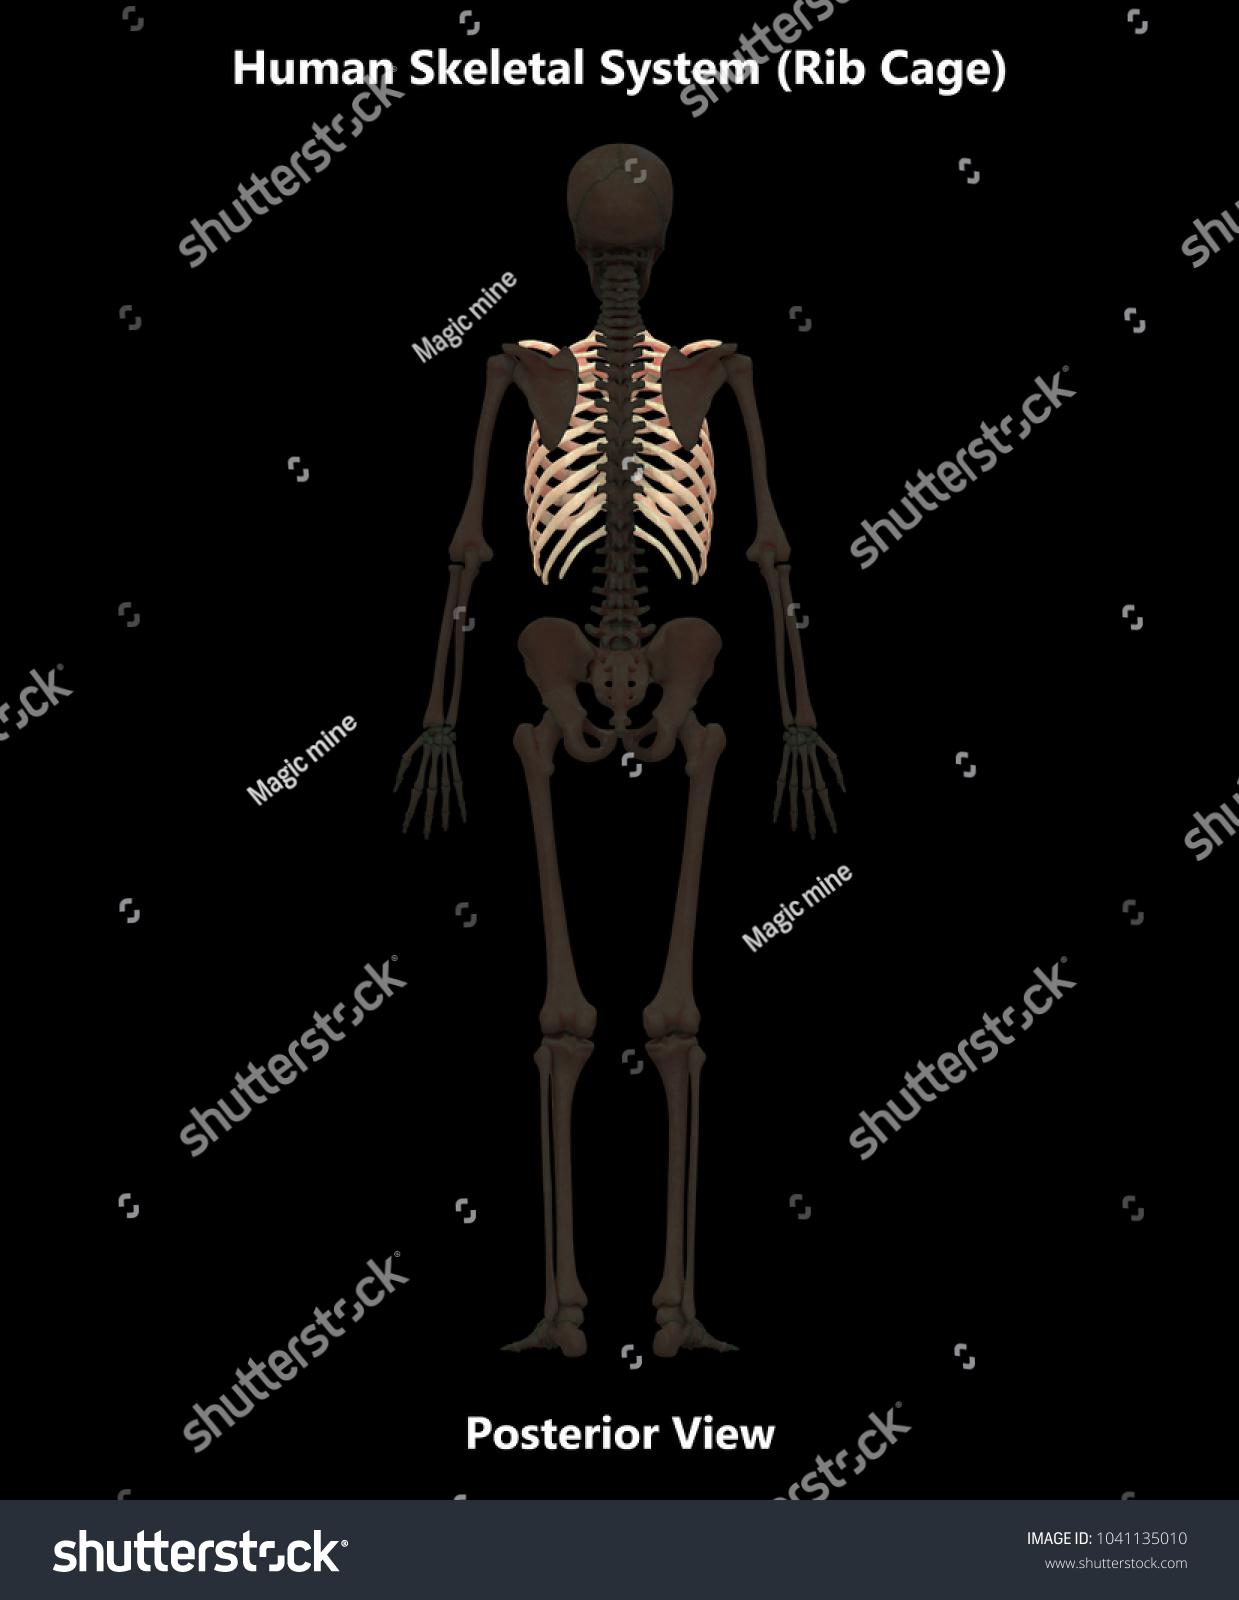 Human Skeleton System Bones Rib Cage Stock Illustration 1041135010 ...